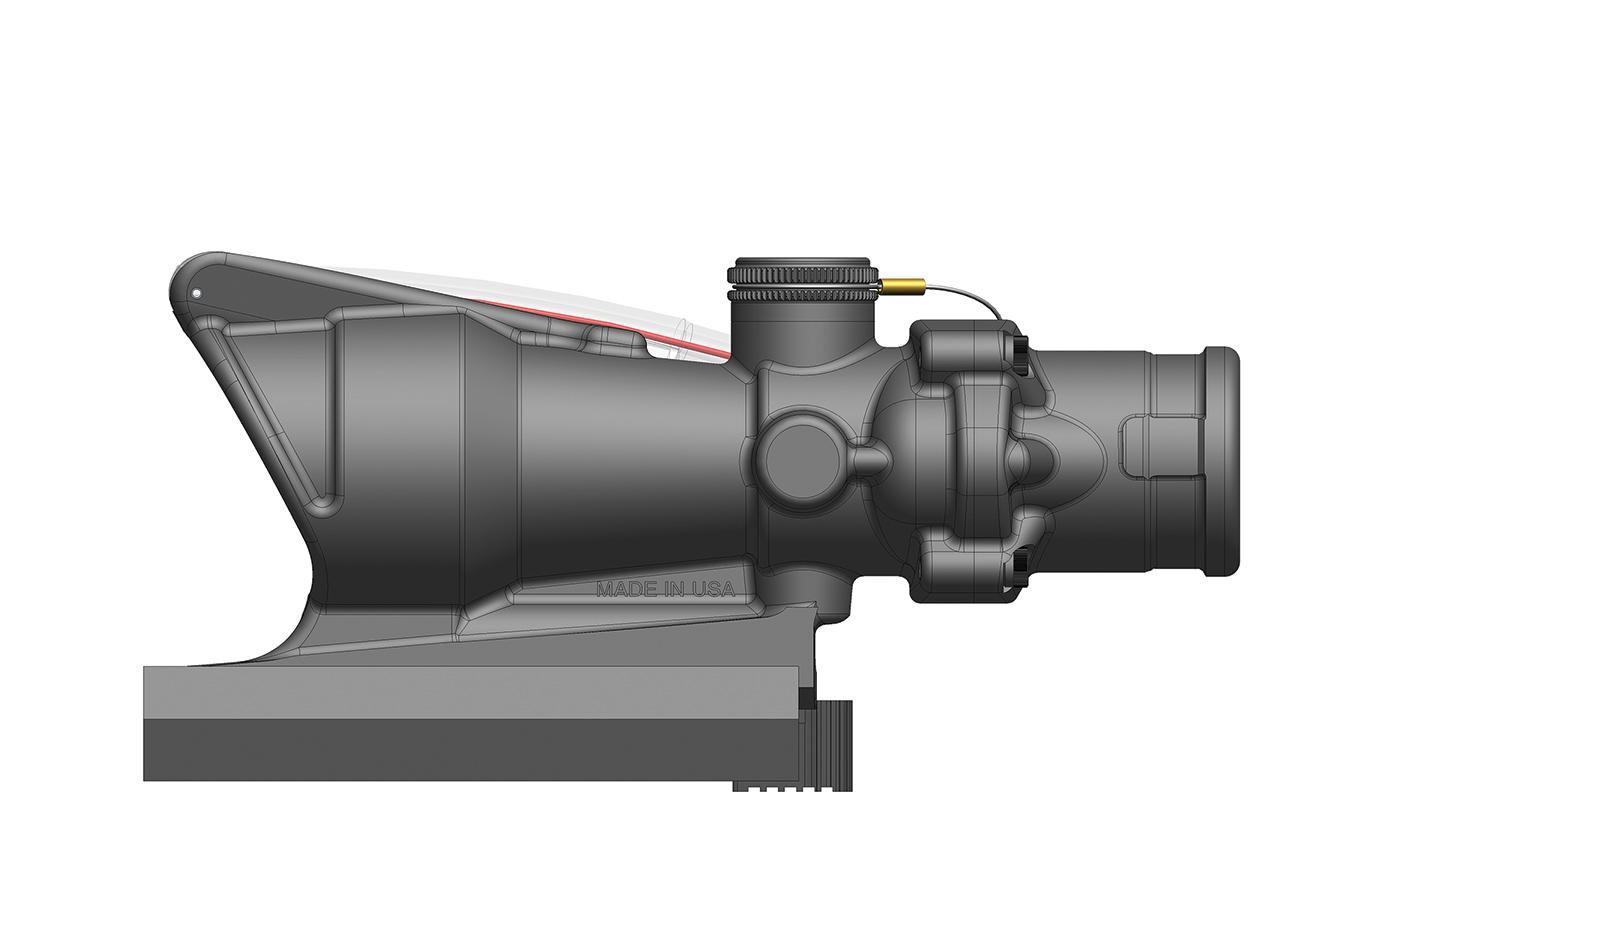 TA31-D-100582 angle 2